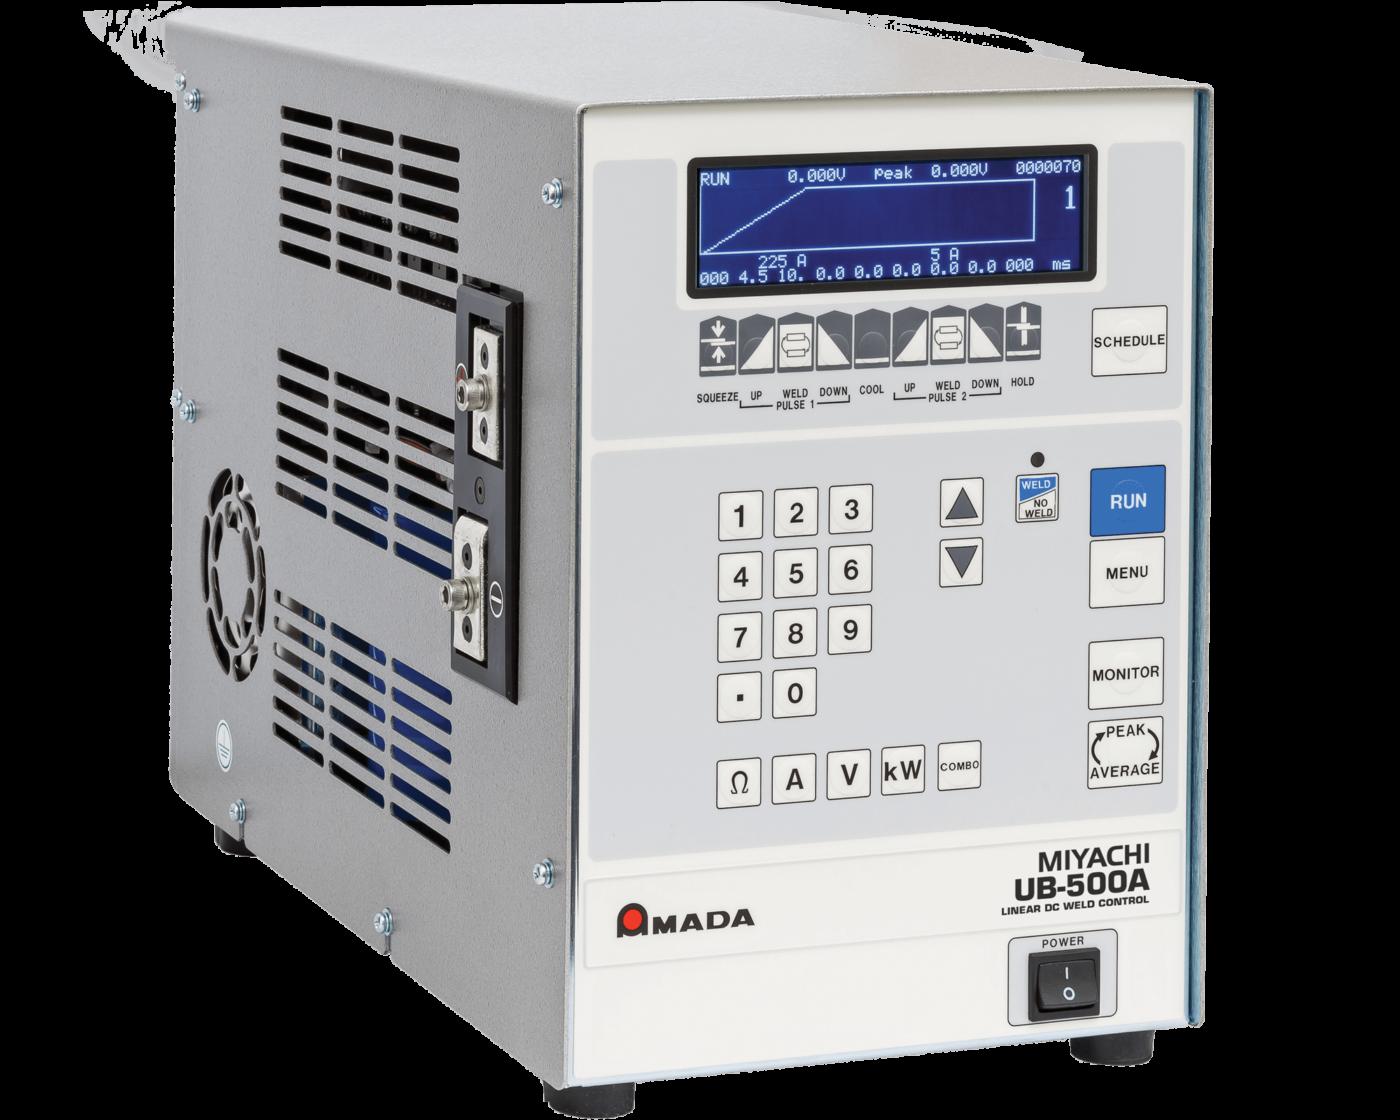 UB-500A Low Power Linear DC Micro Spot Welder